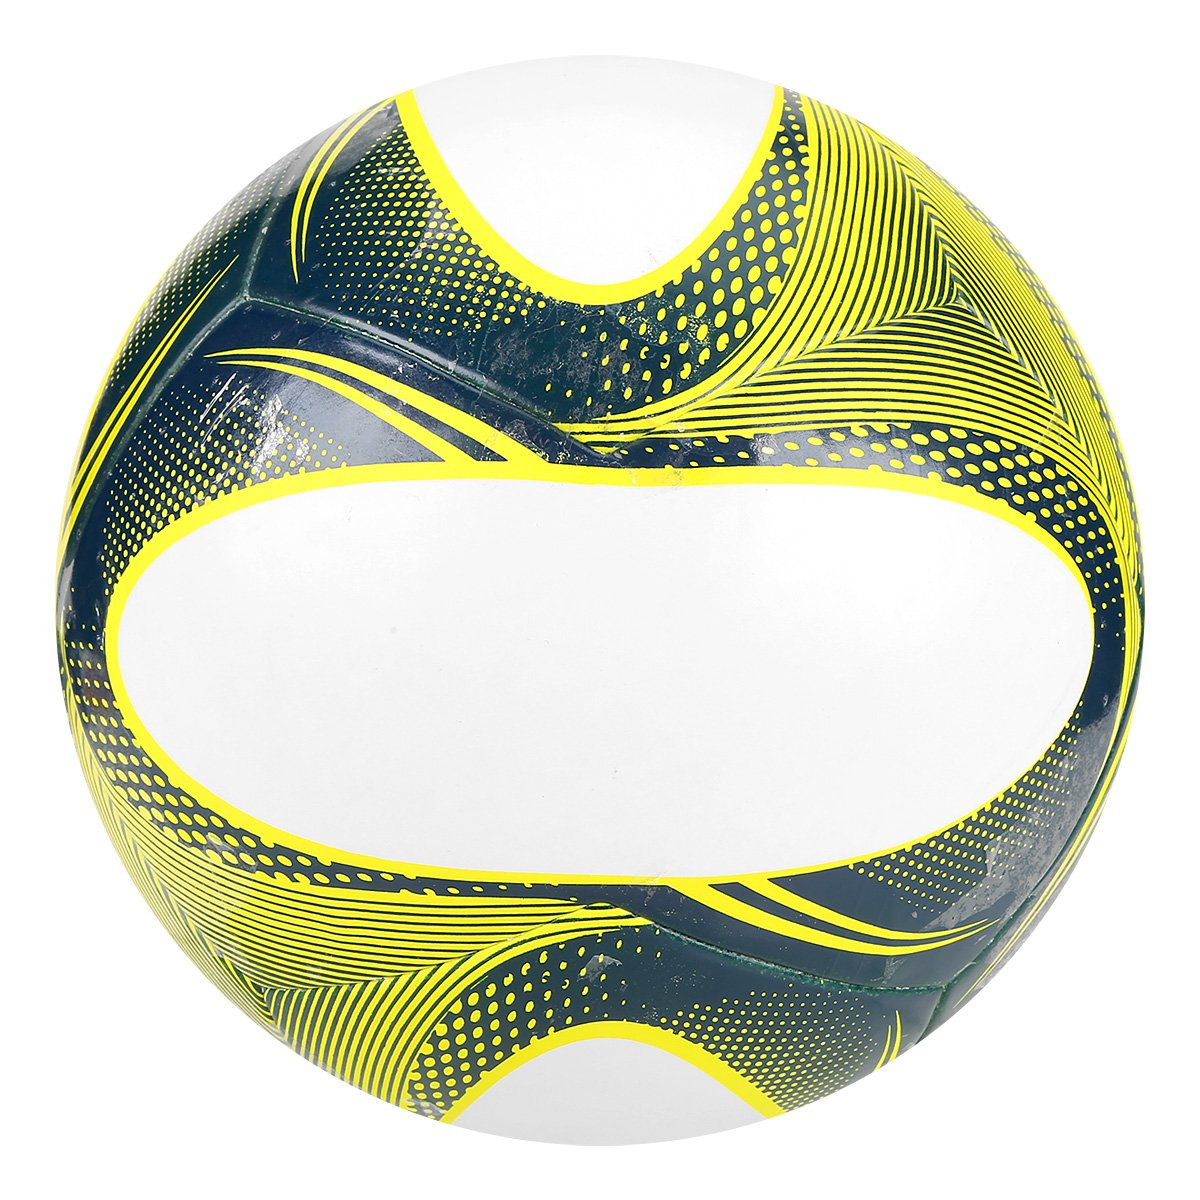 Bola Futebol Campo Topper Slick II - Preto e Amarelo - Compre Agora ... ab1771ba5b02a